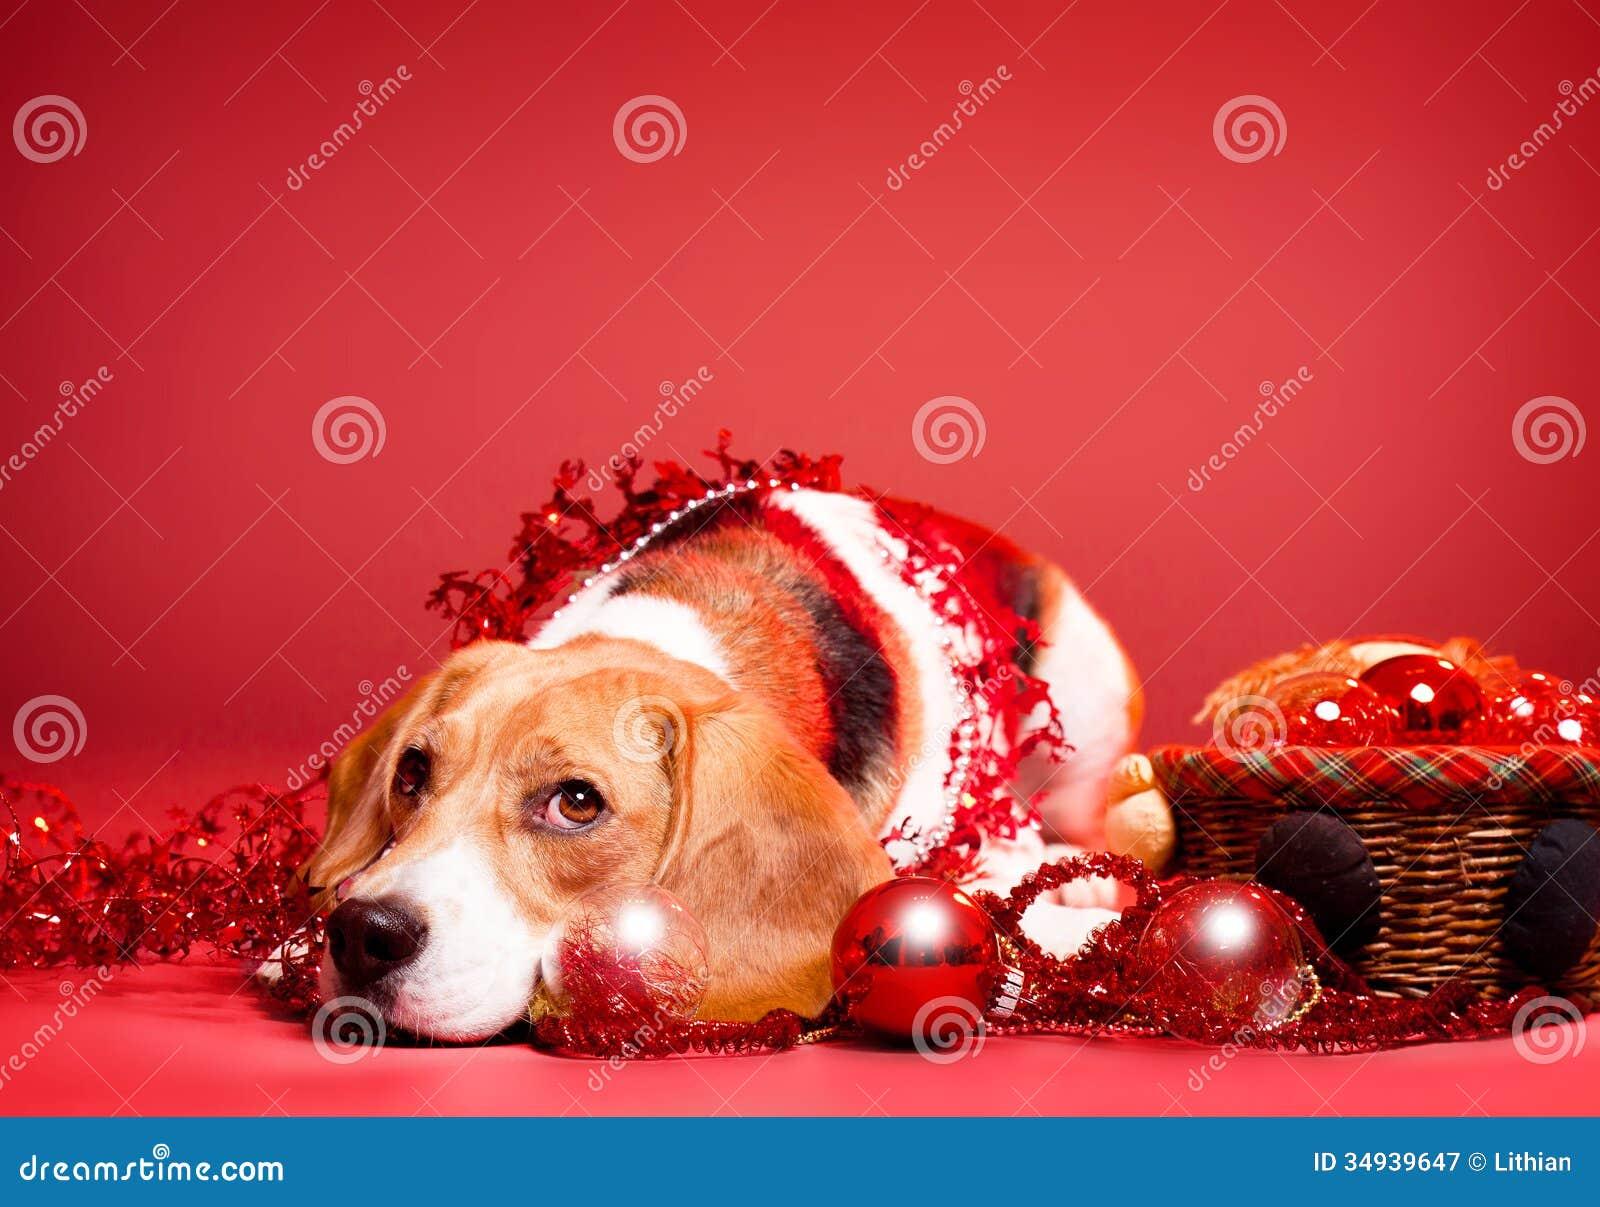 Beagle Christmas Gifts on Zazzle